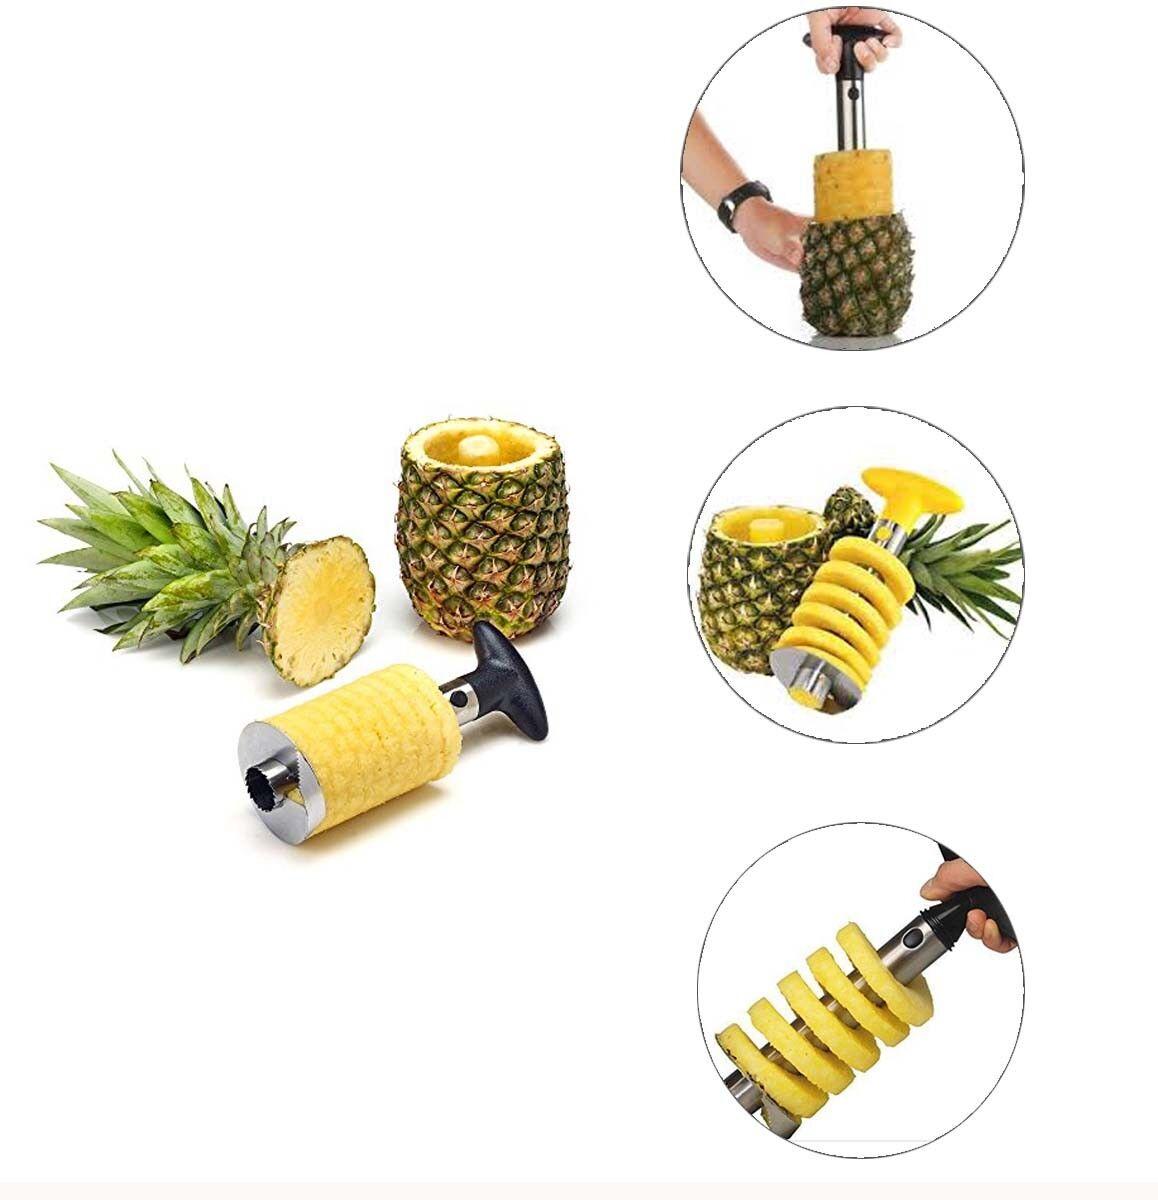 Pineapple Slicer Fruit Cutter Easy Kitchen Tool  Peeler USA BEST QUALITY